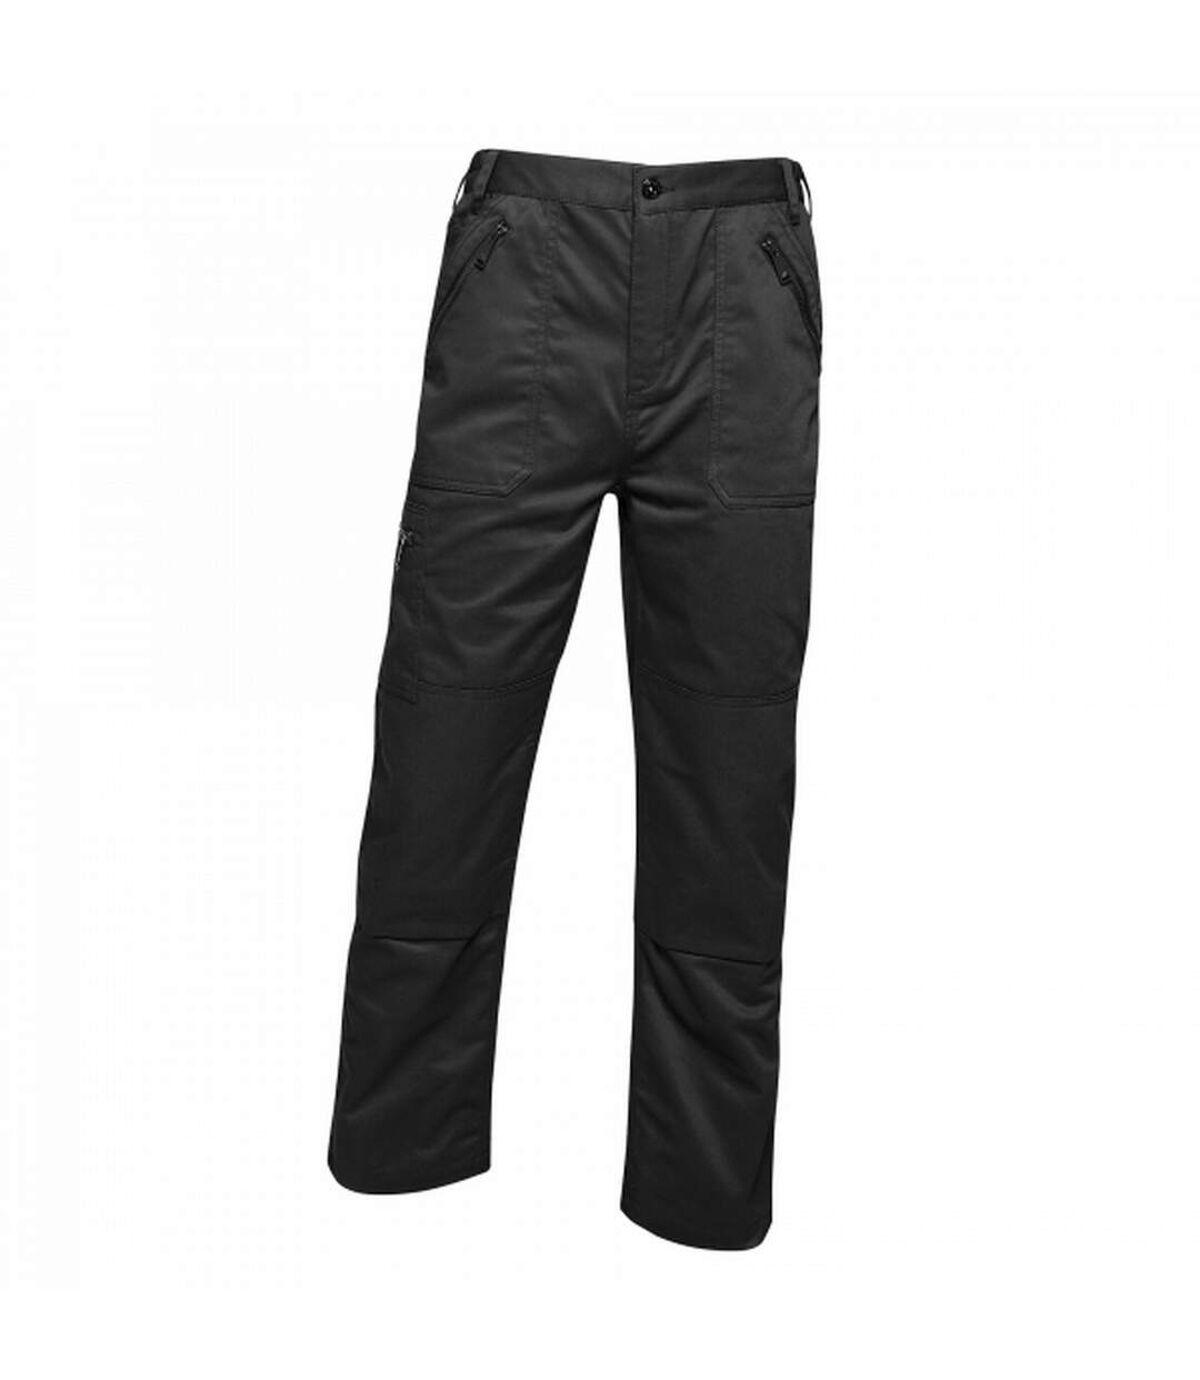 Regatta Mens Pro Action Waterproof Trousers - Regular (Traffic Black) - UTRG3751